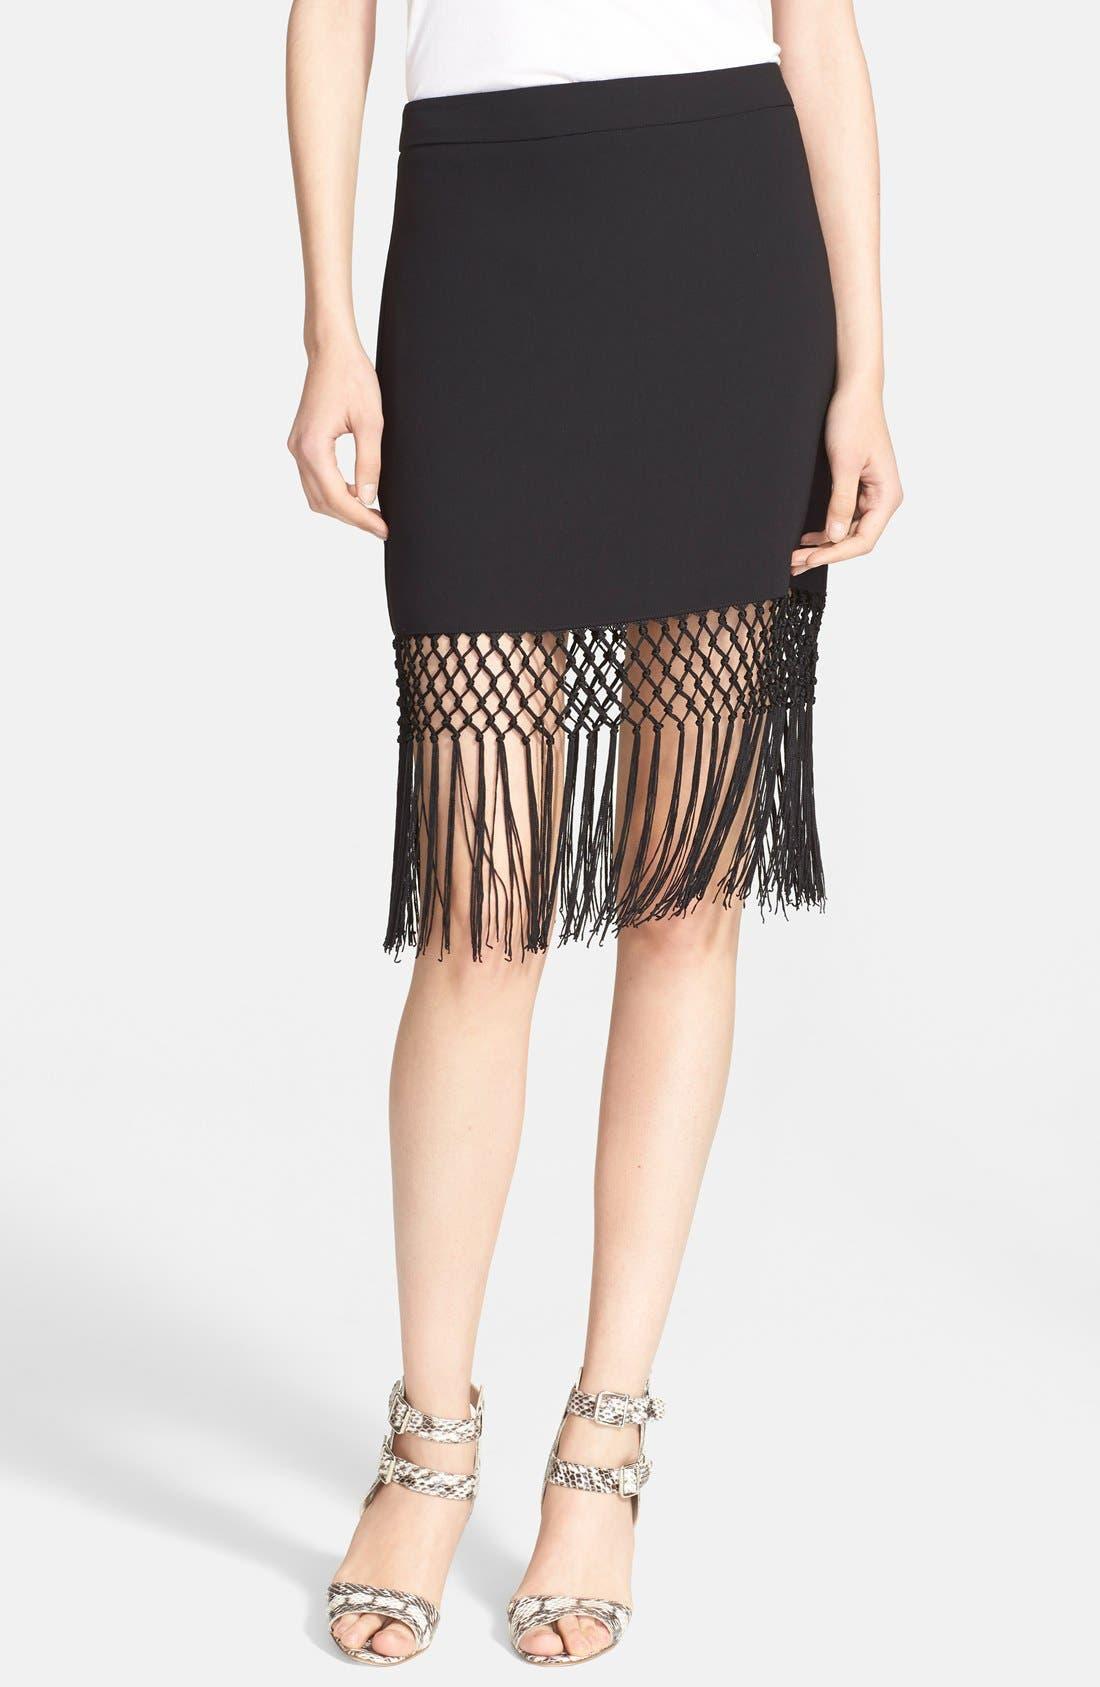 Main Image - Trina Turk 'Luciana' Crochet Fringe Pencil Skirt